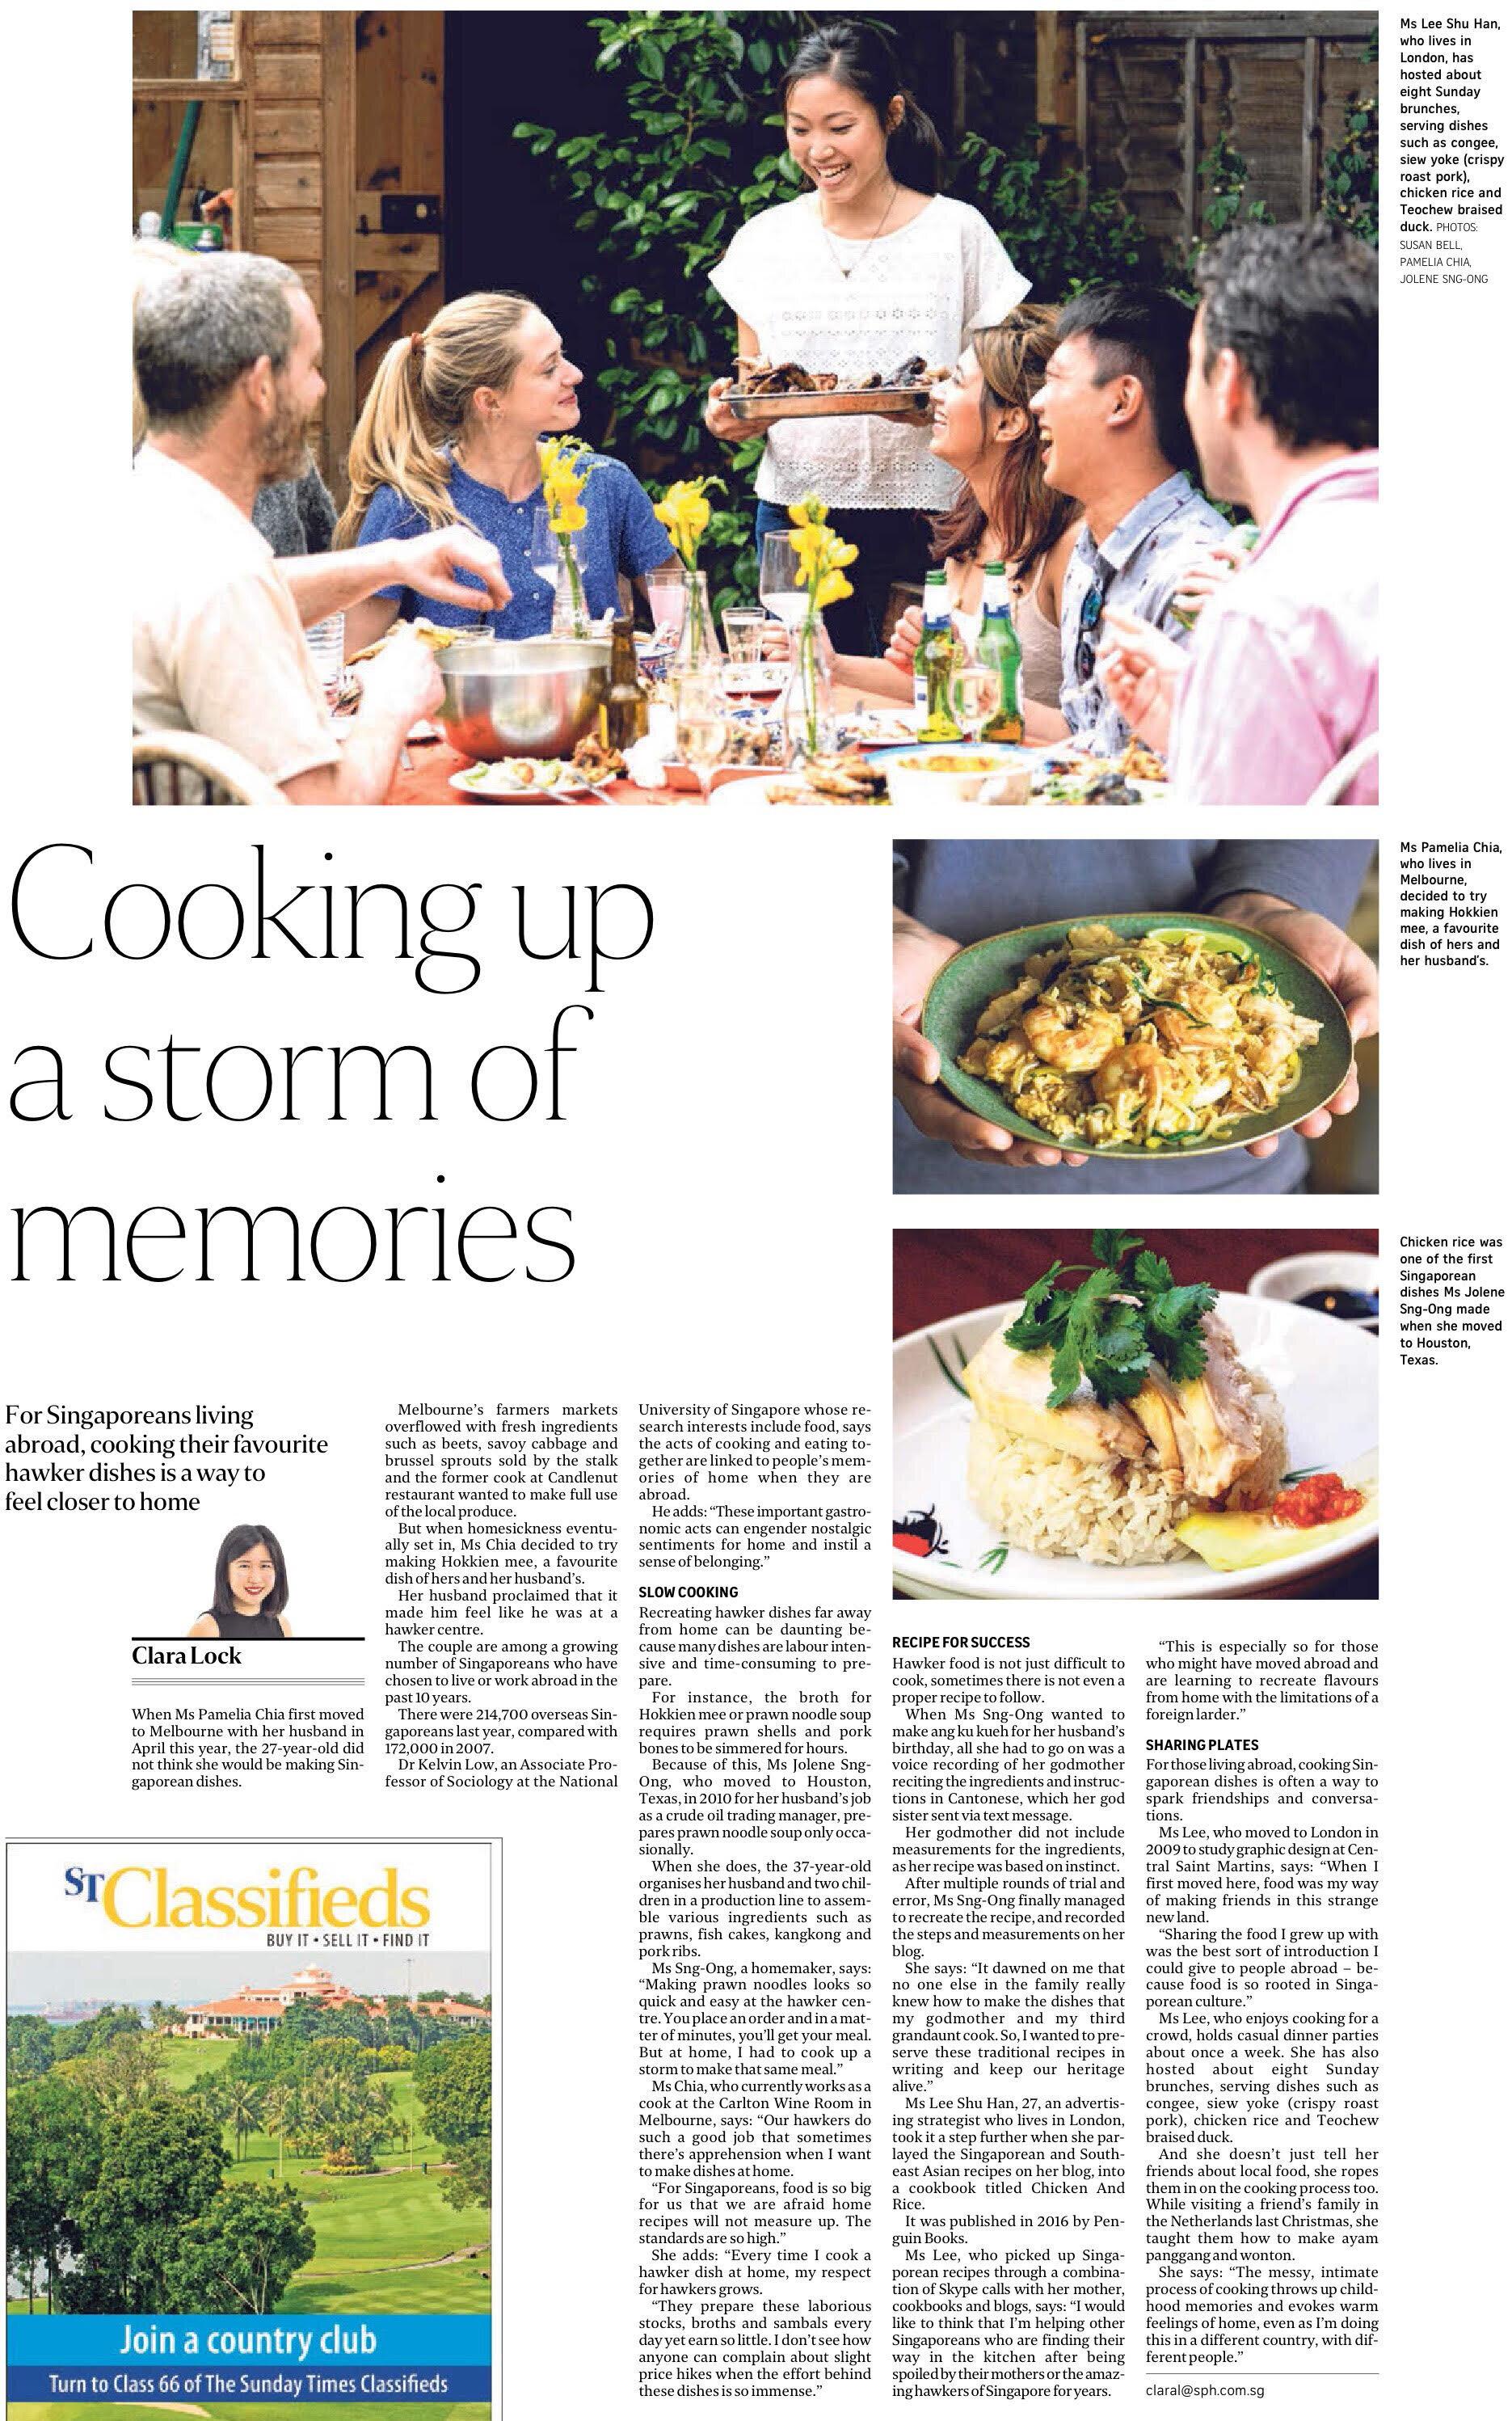 The Straits Times (Singapore), Sep 2018